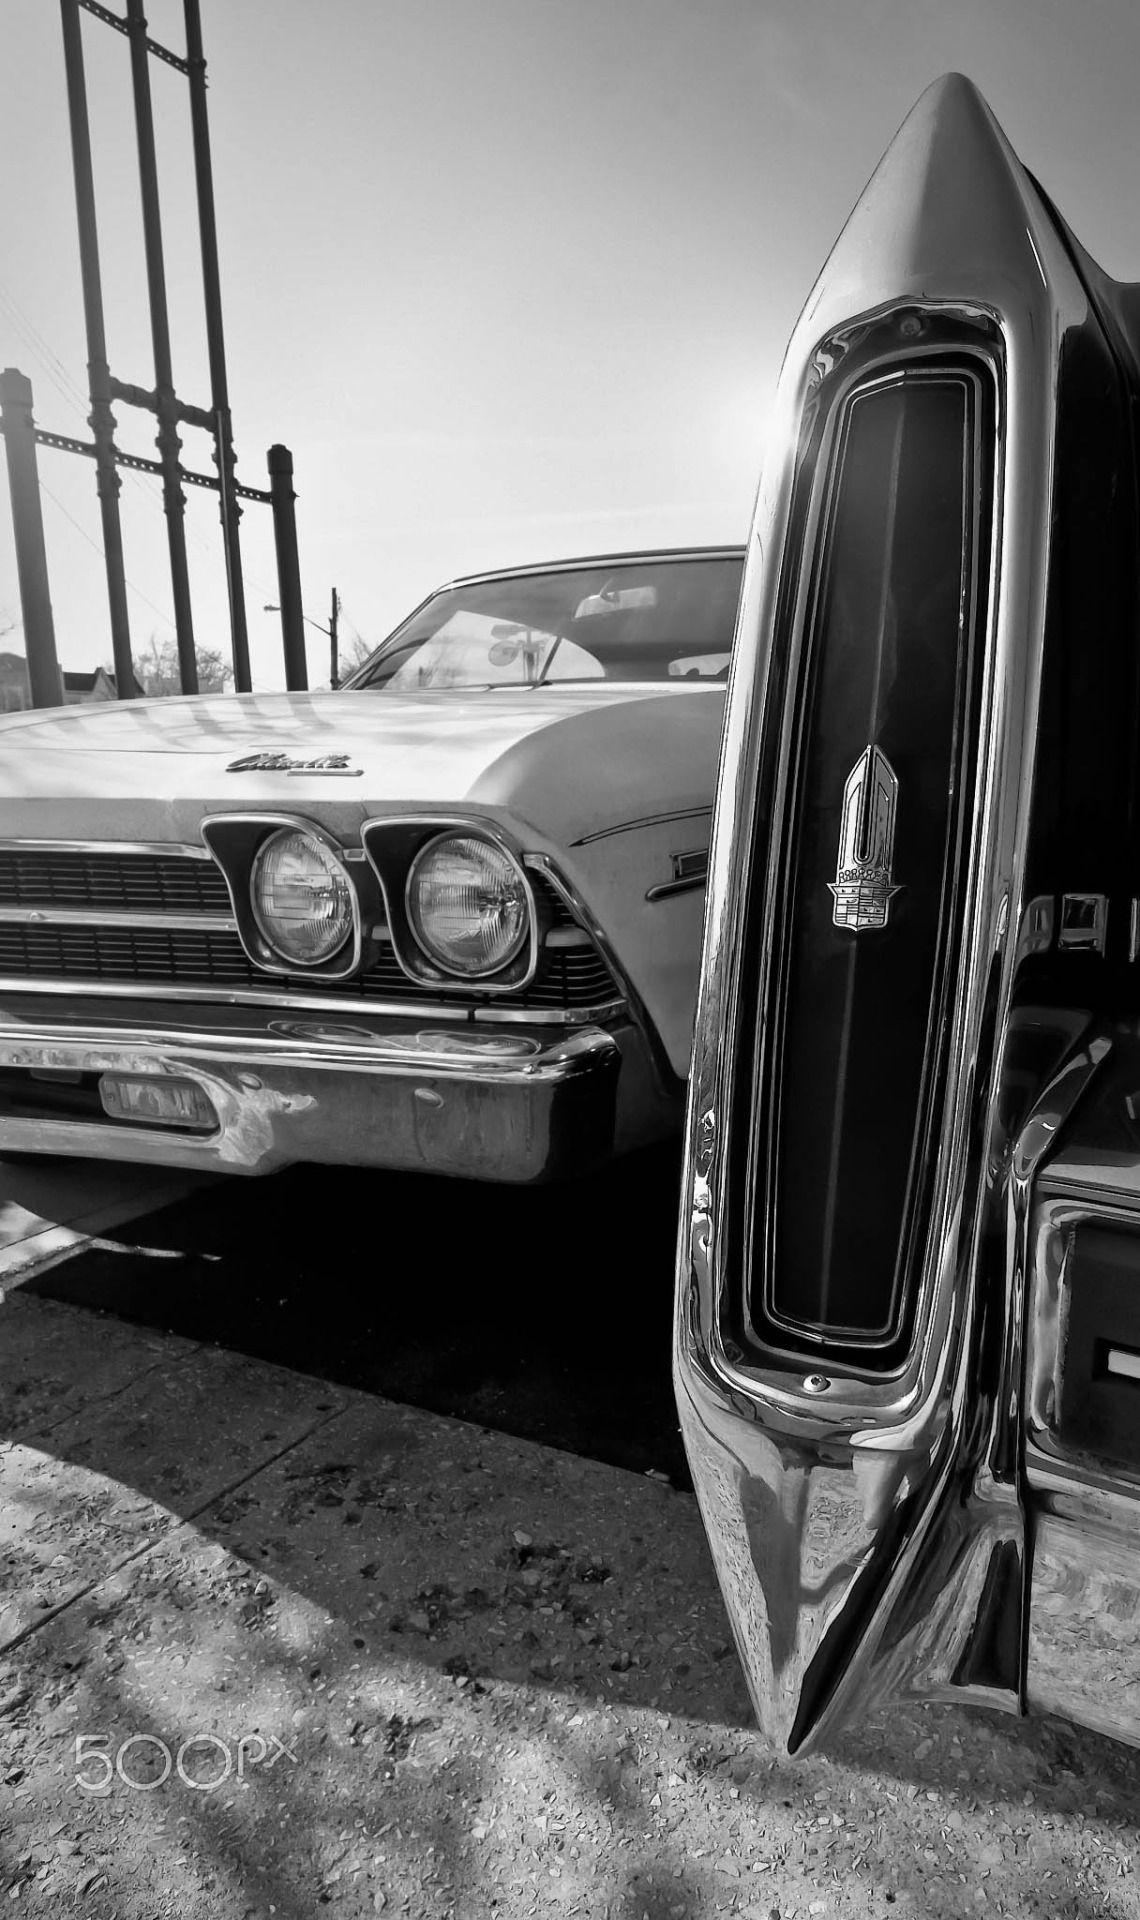 Picture by julien boudet bleu mode locked keys in car